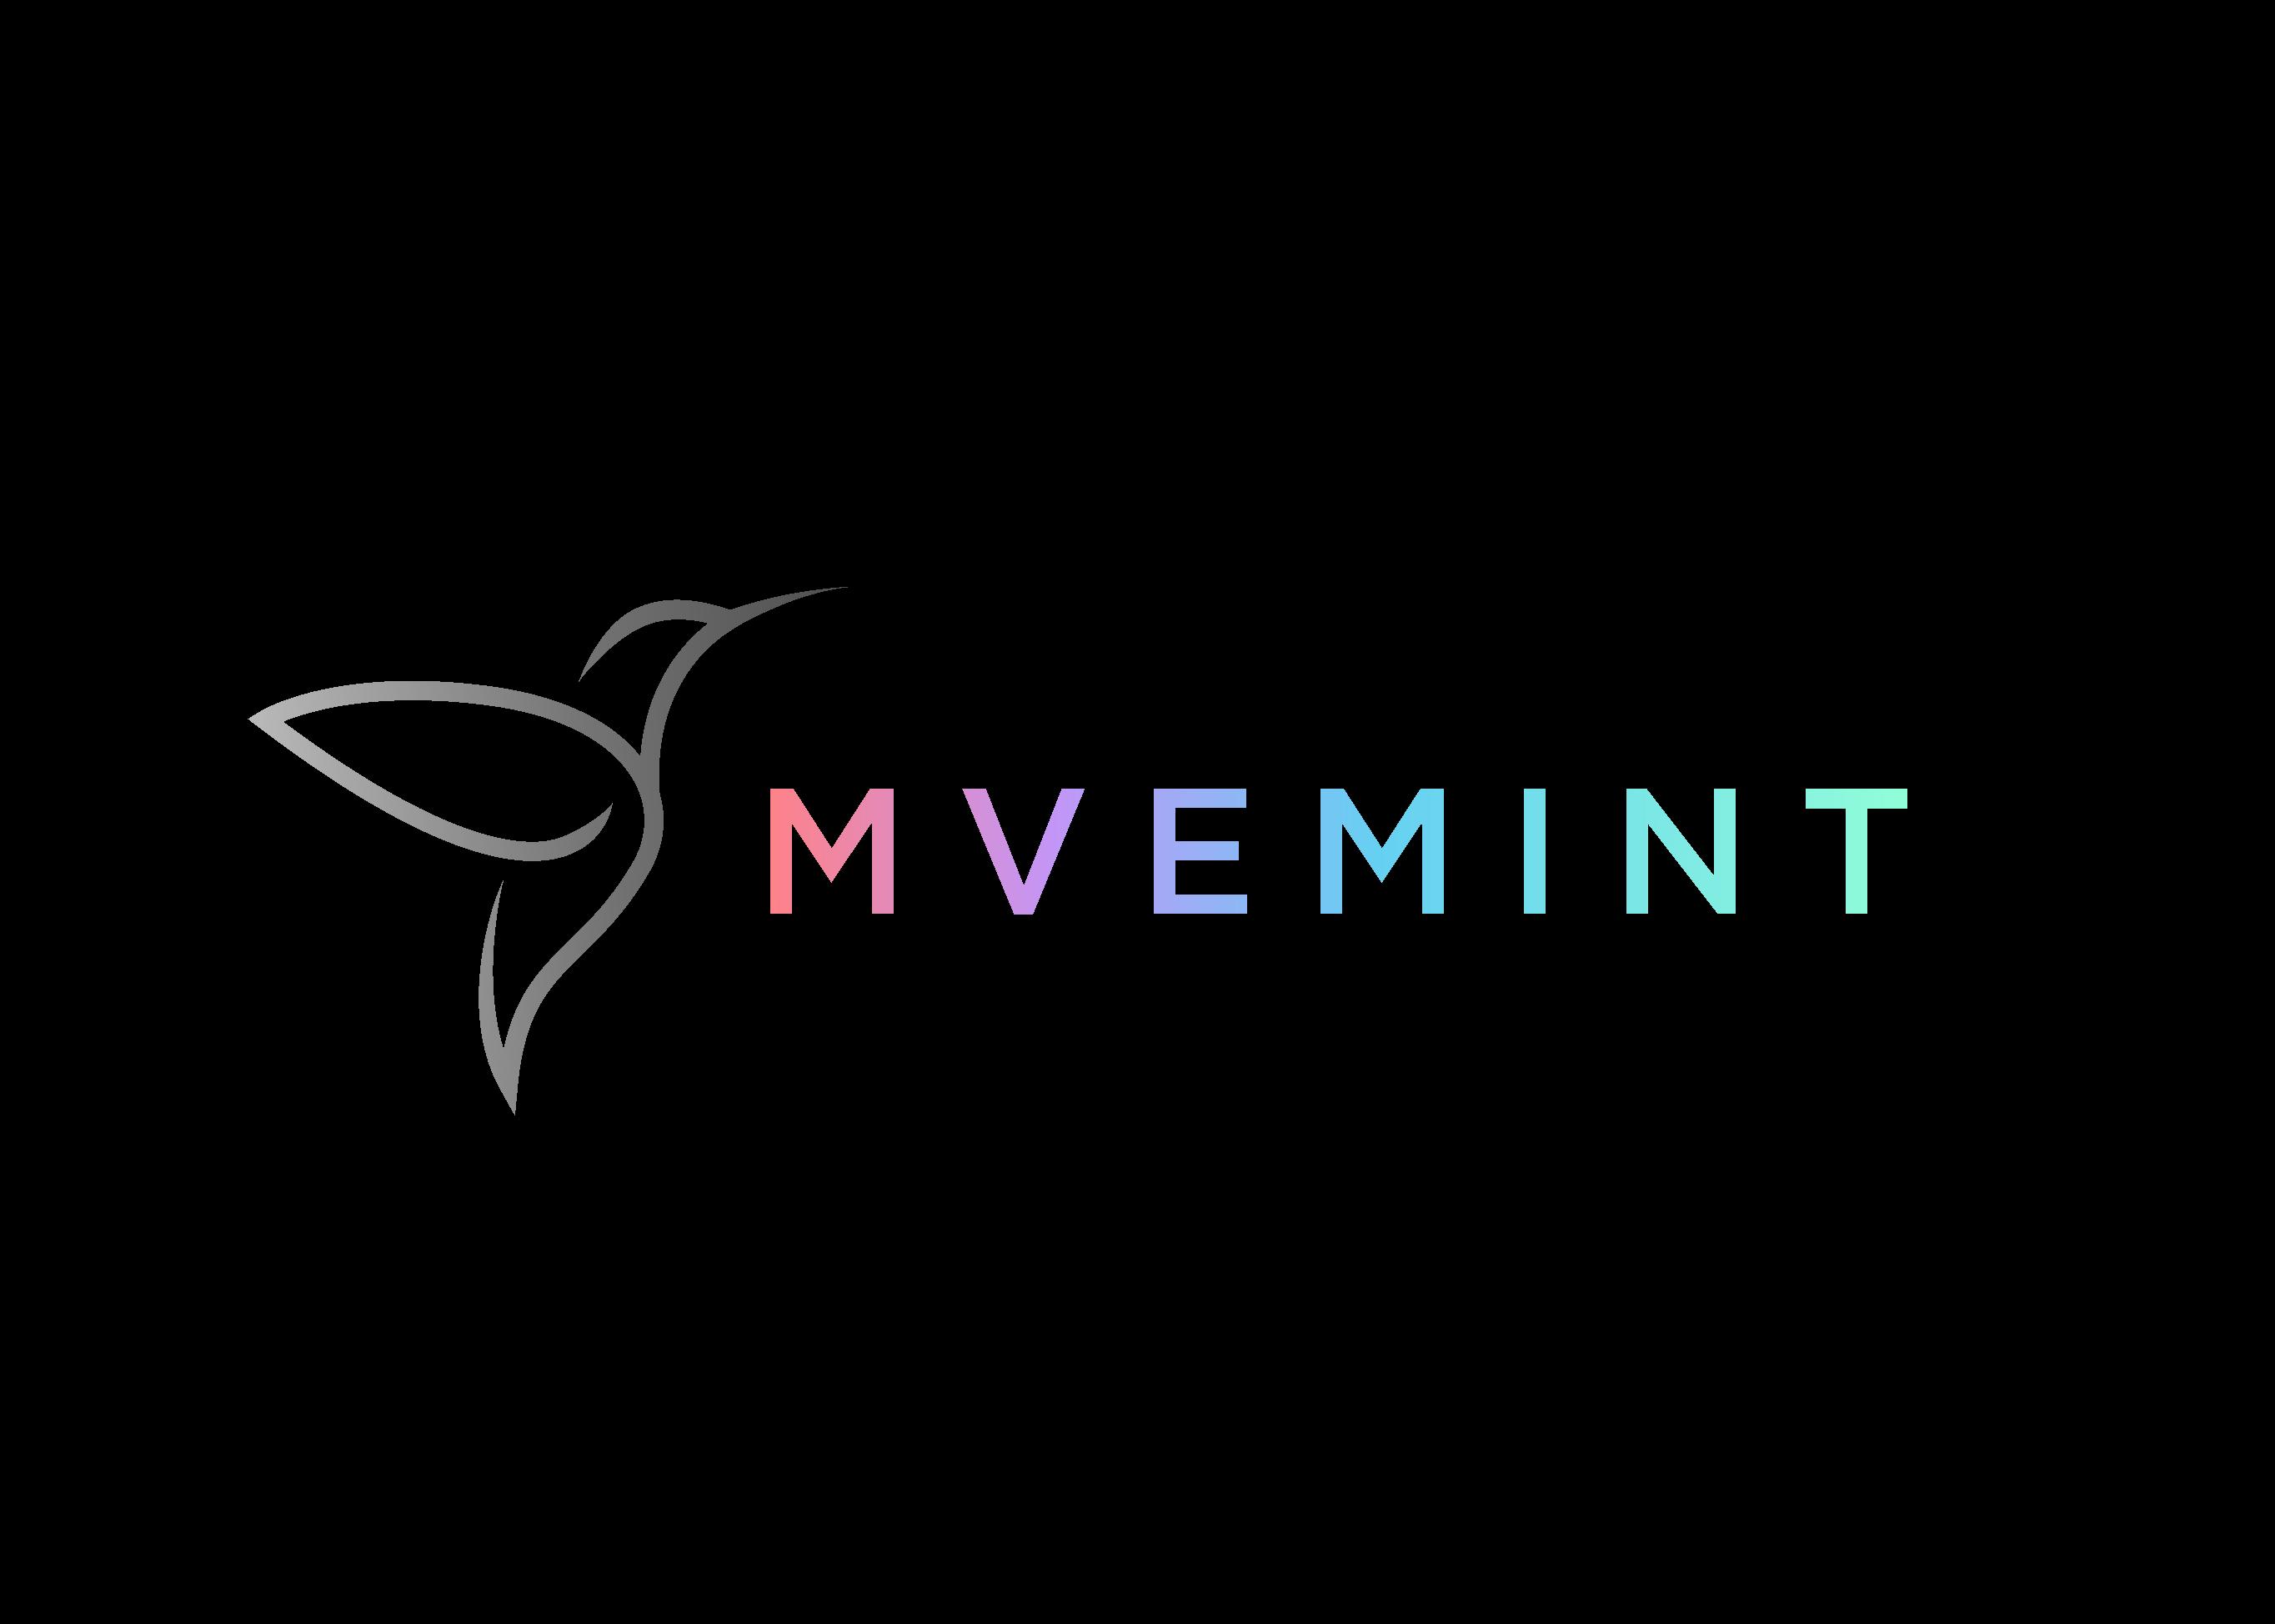 Mvemint